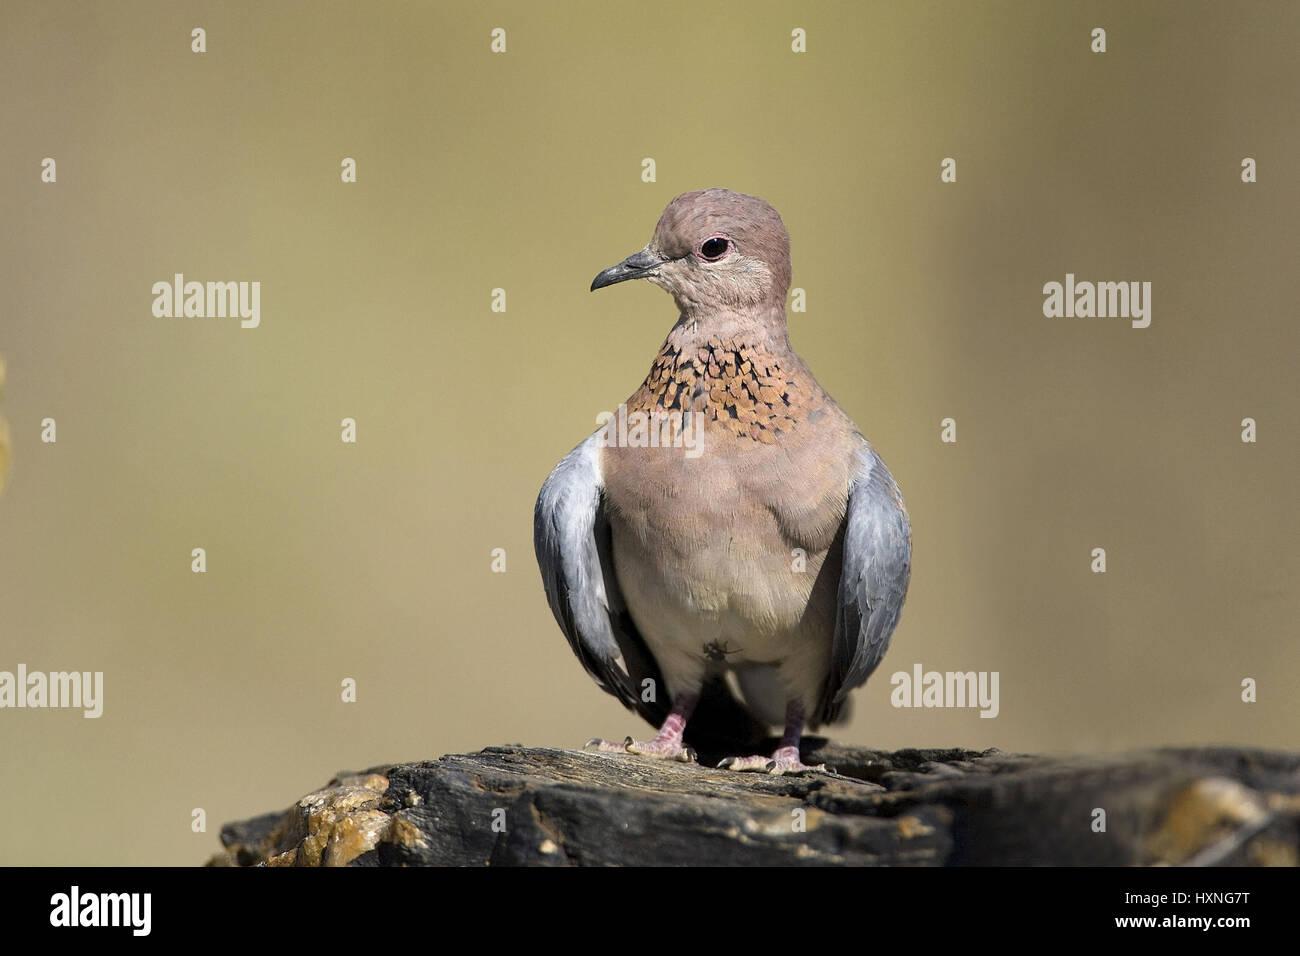 Senegal pigeon, Streptopelia senegalensis - Laughing Dove, Senegaltaube | Streptopelia senegalensis -  Laughing - Stock Image